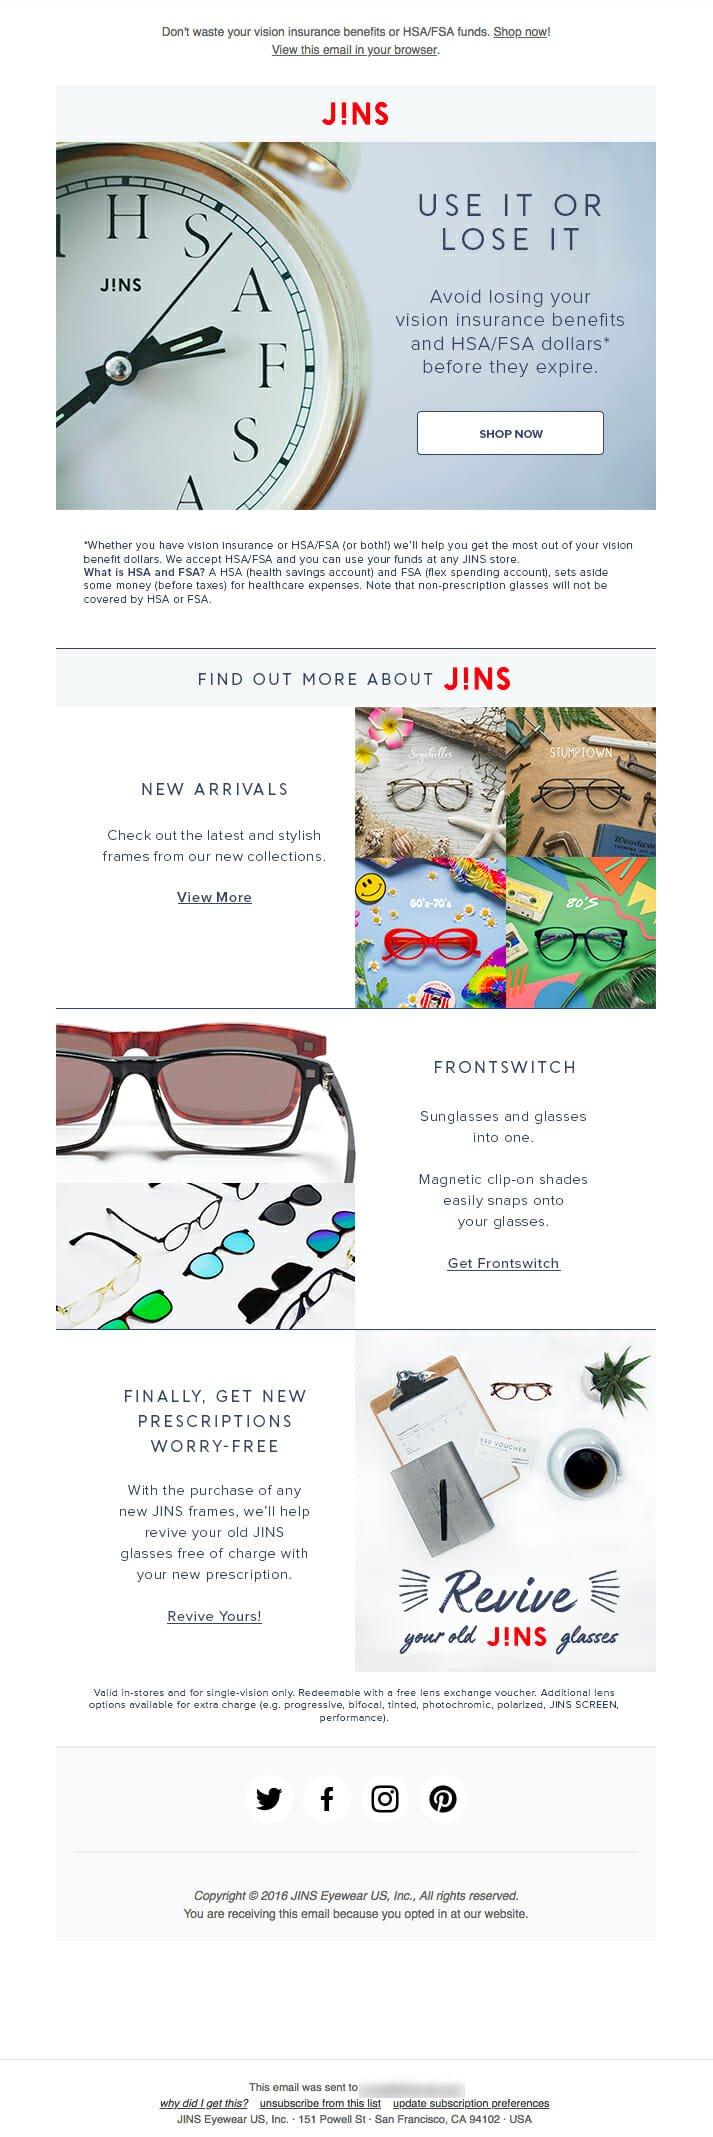 Jins Newsletter Example For Prescription Eyeglass Stores